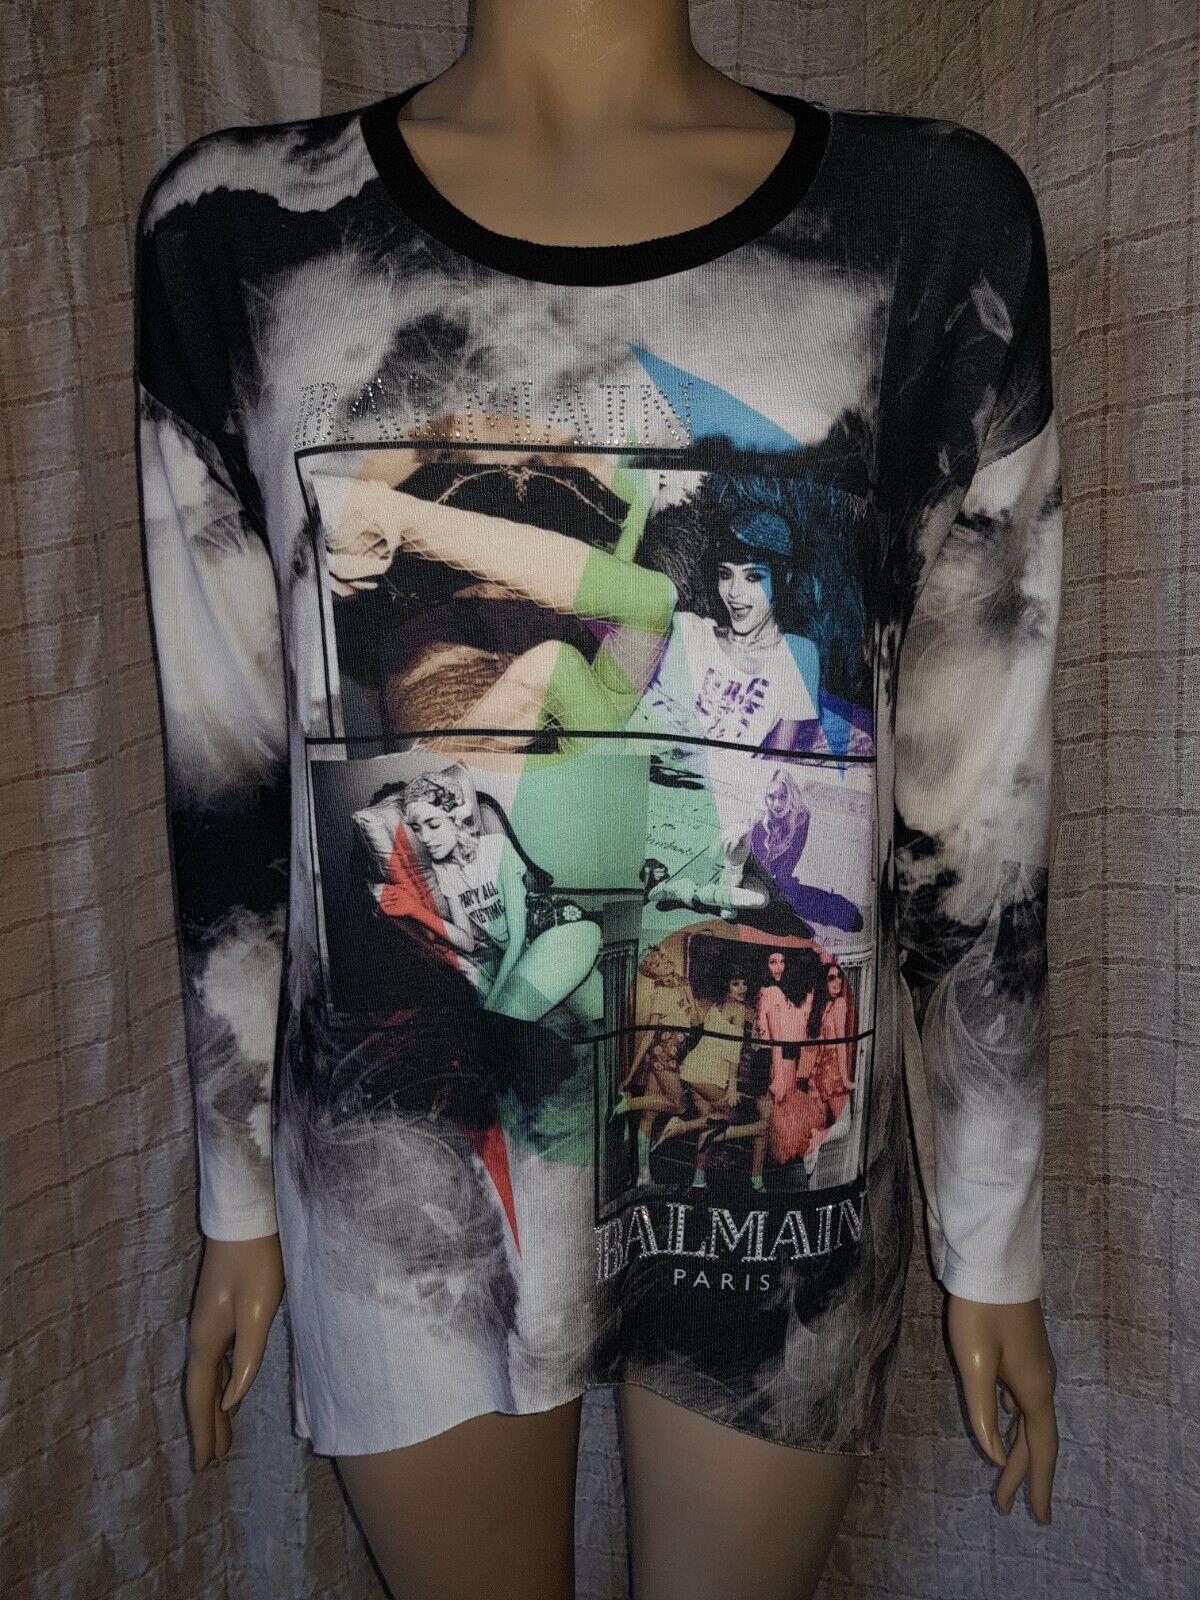 Balmain damen printed cotton bleached effect overGrößed tunic blouse Größe M